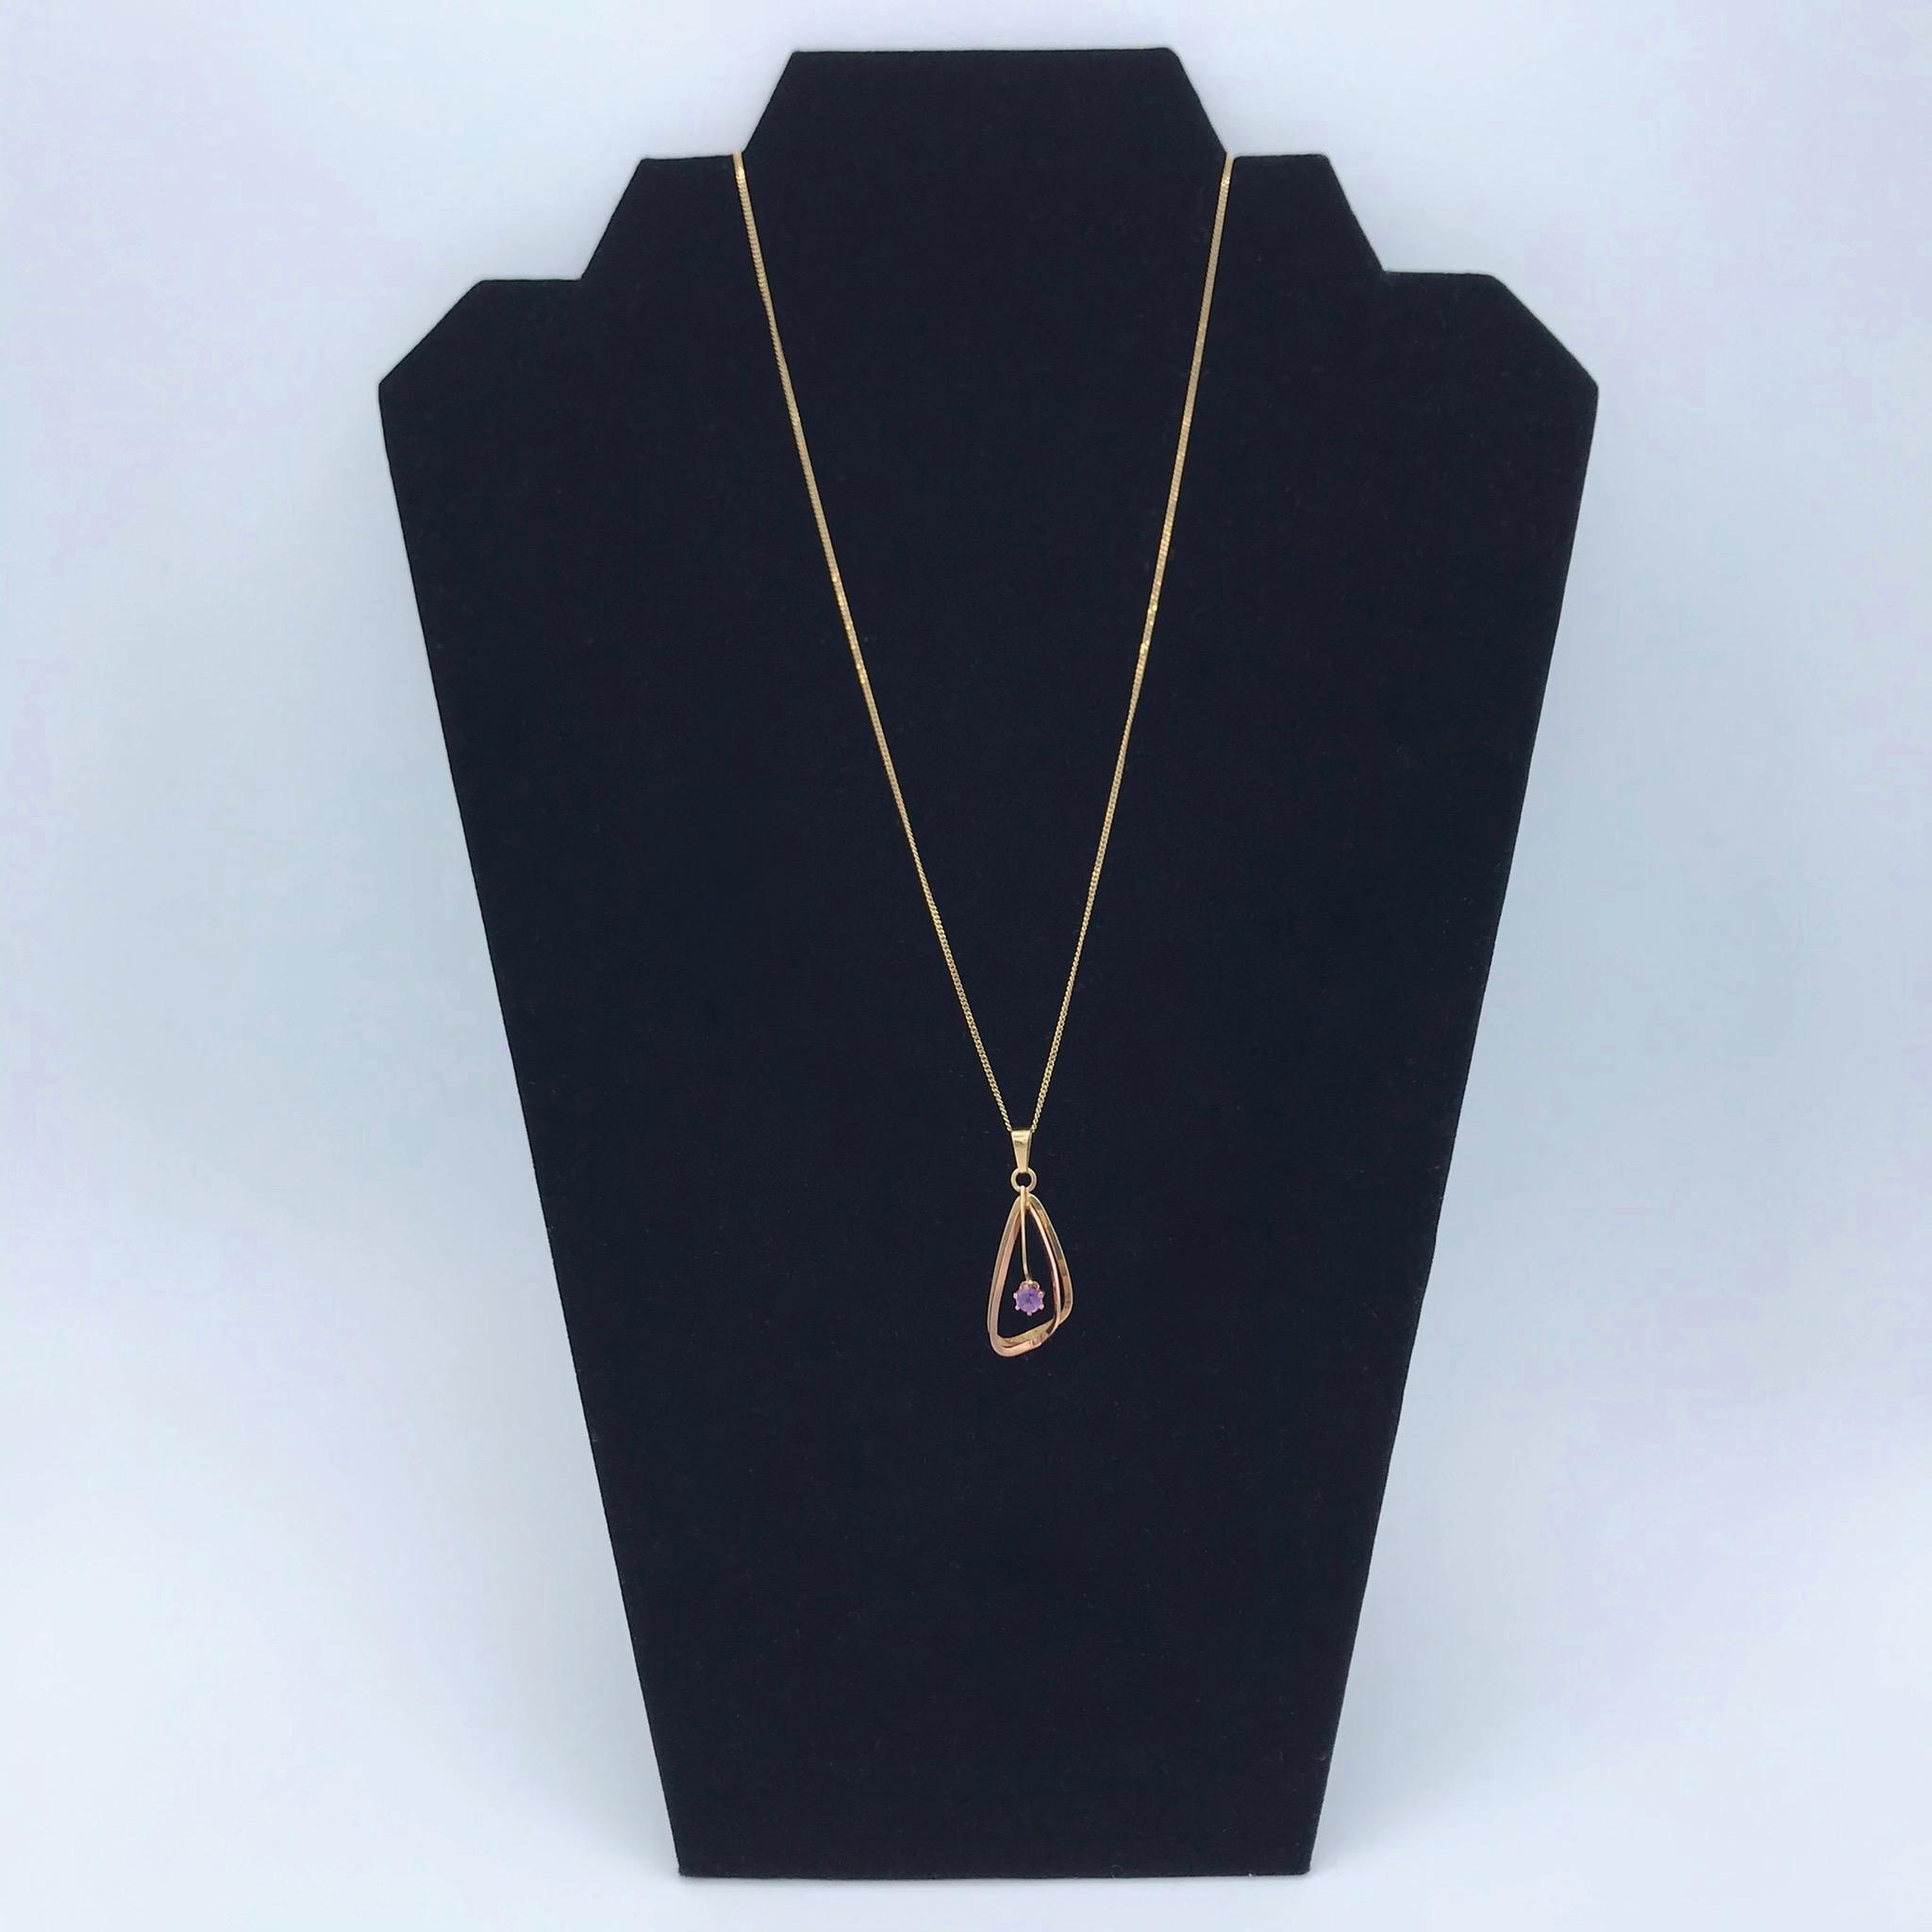 Gold & Amethyst Drop Necklace